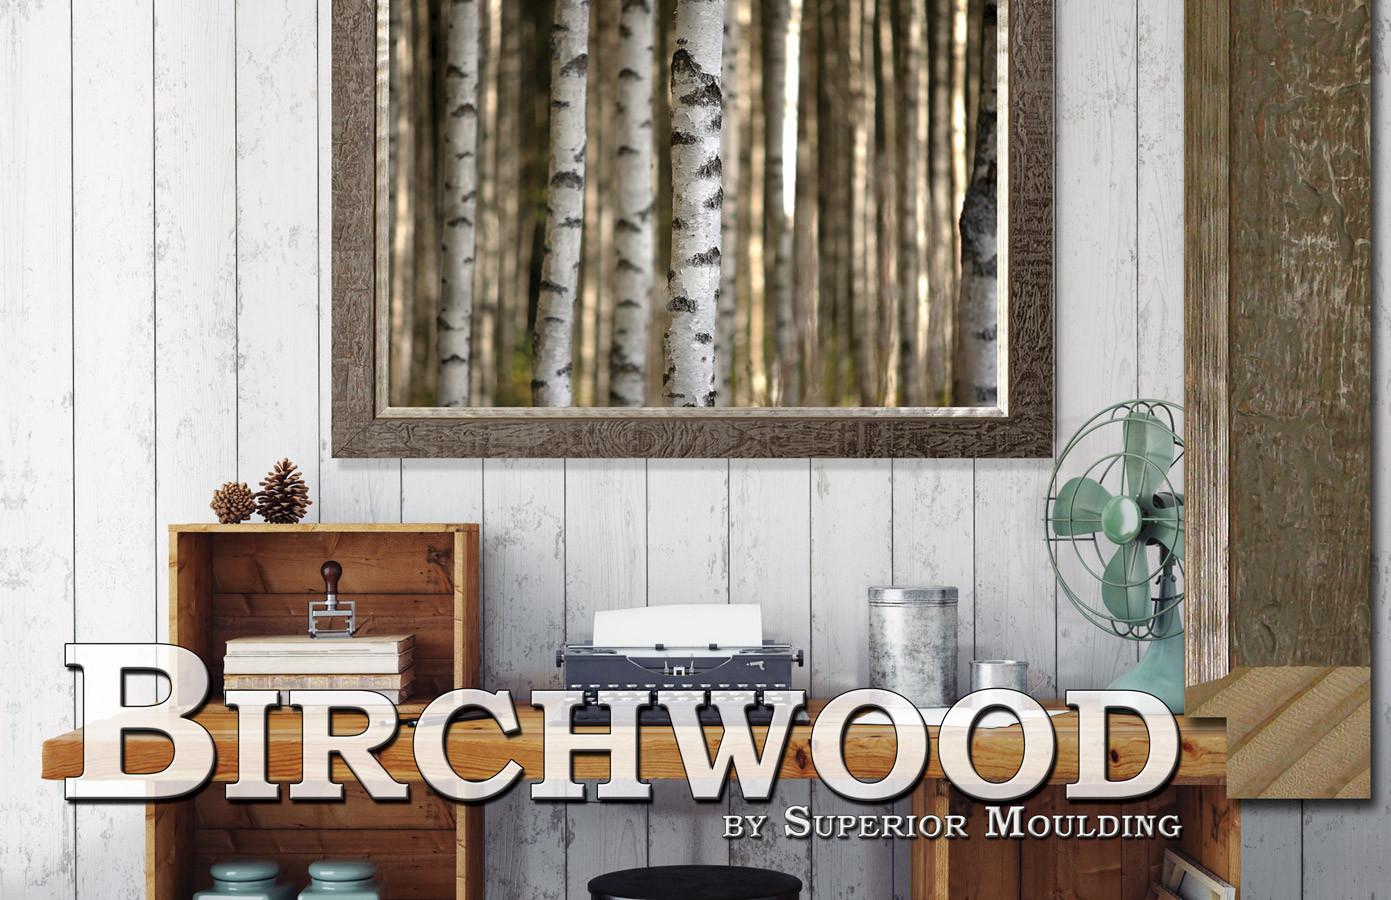 Birchwood Moulding